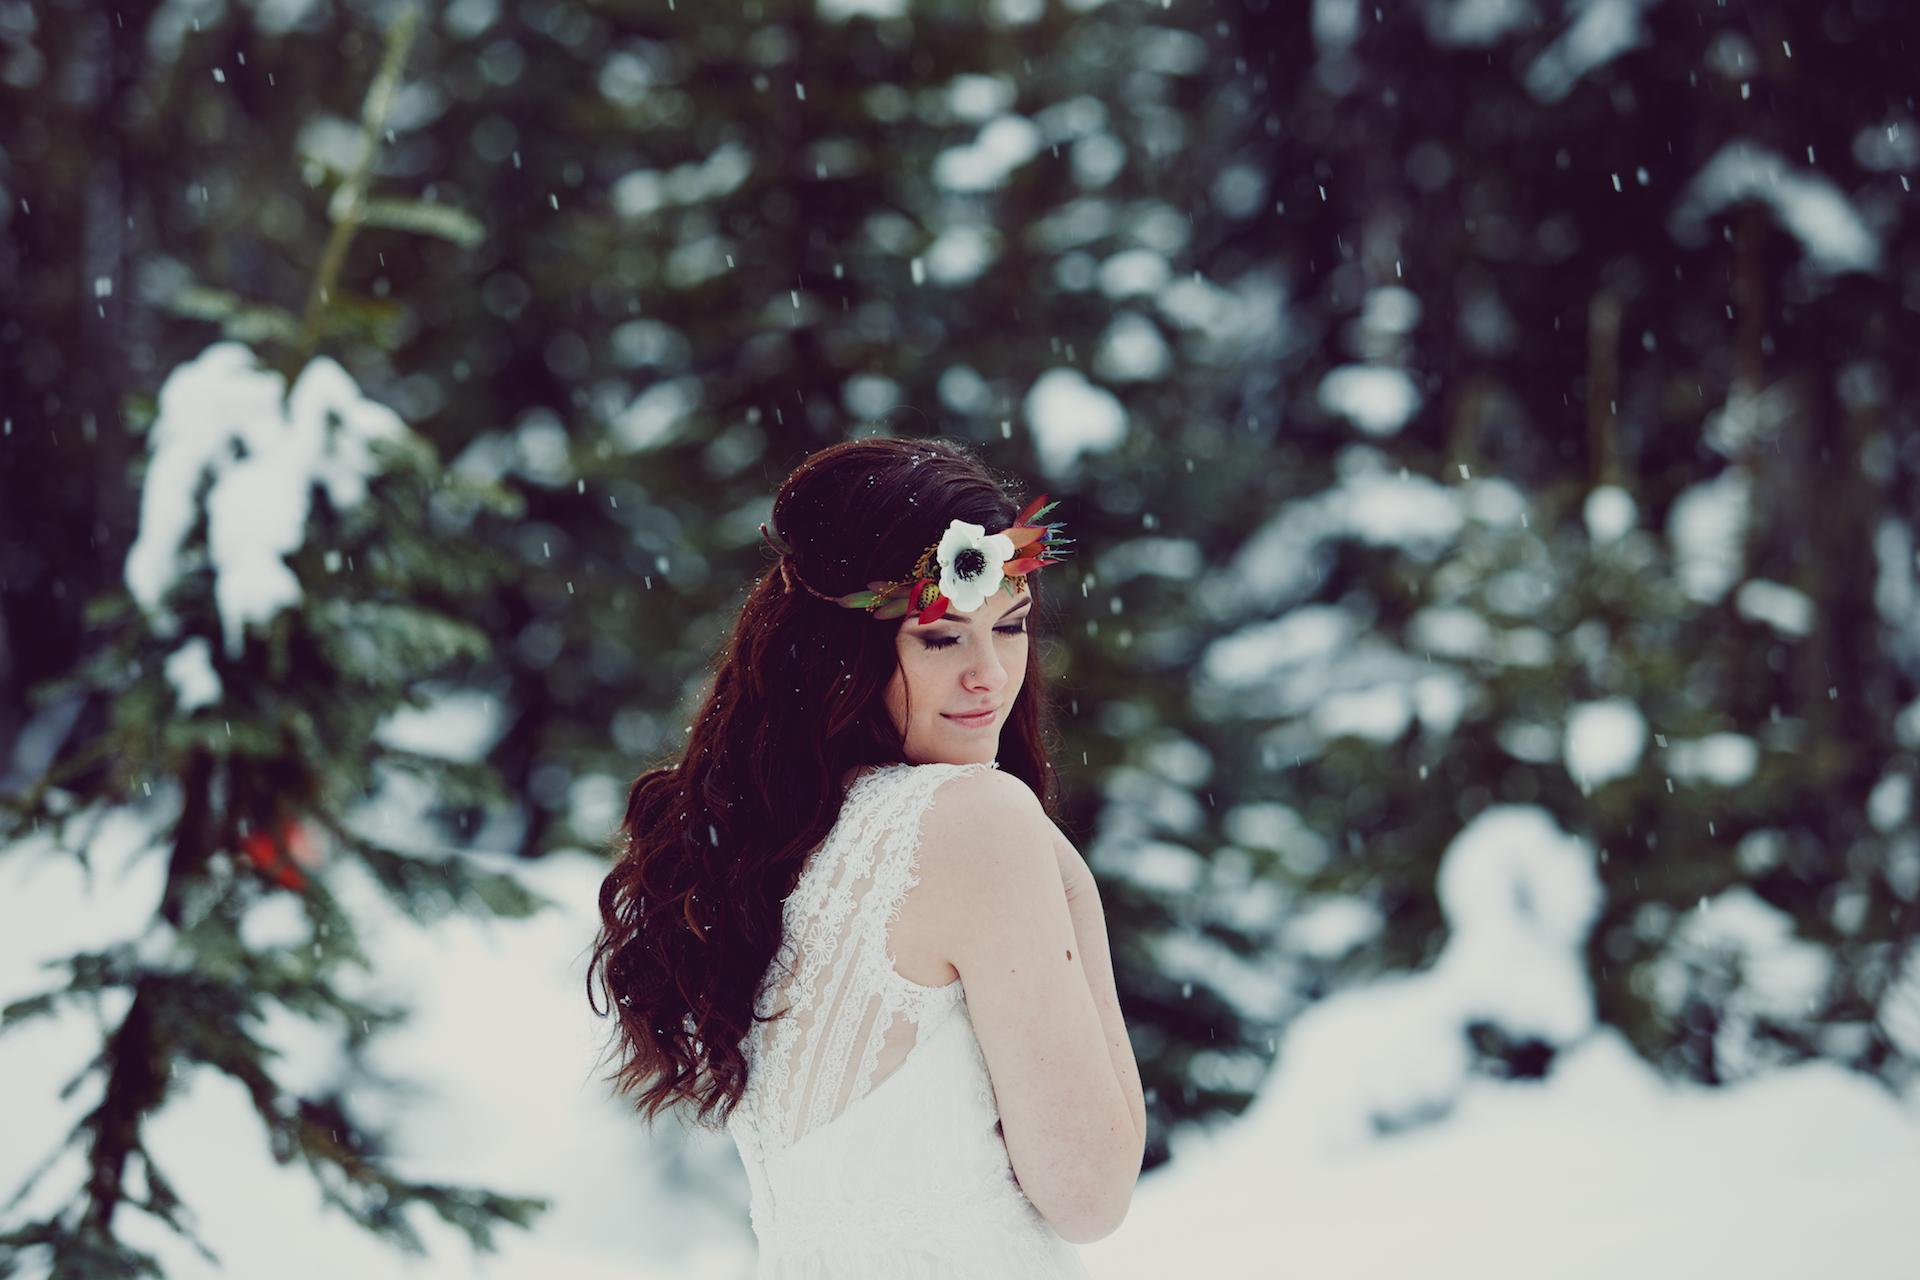 Island Moments Photography | The Bride's Closet | Shear Inspiration Studio | Purely Flower | MLKANHNY | The Little Green Apple | West Coast Weddings | BC Wedding Magazine | Vancouver Island Wedding